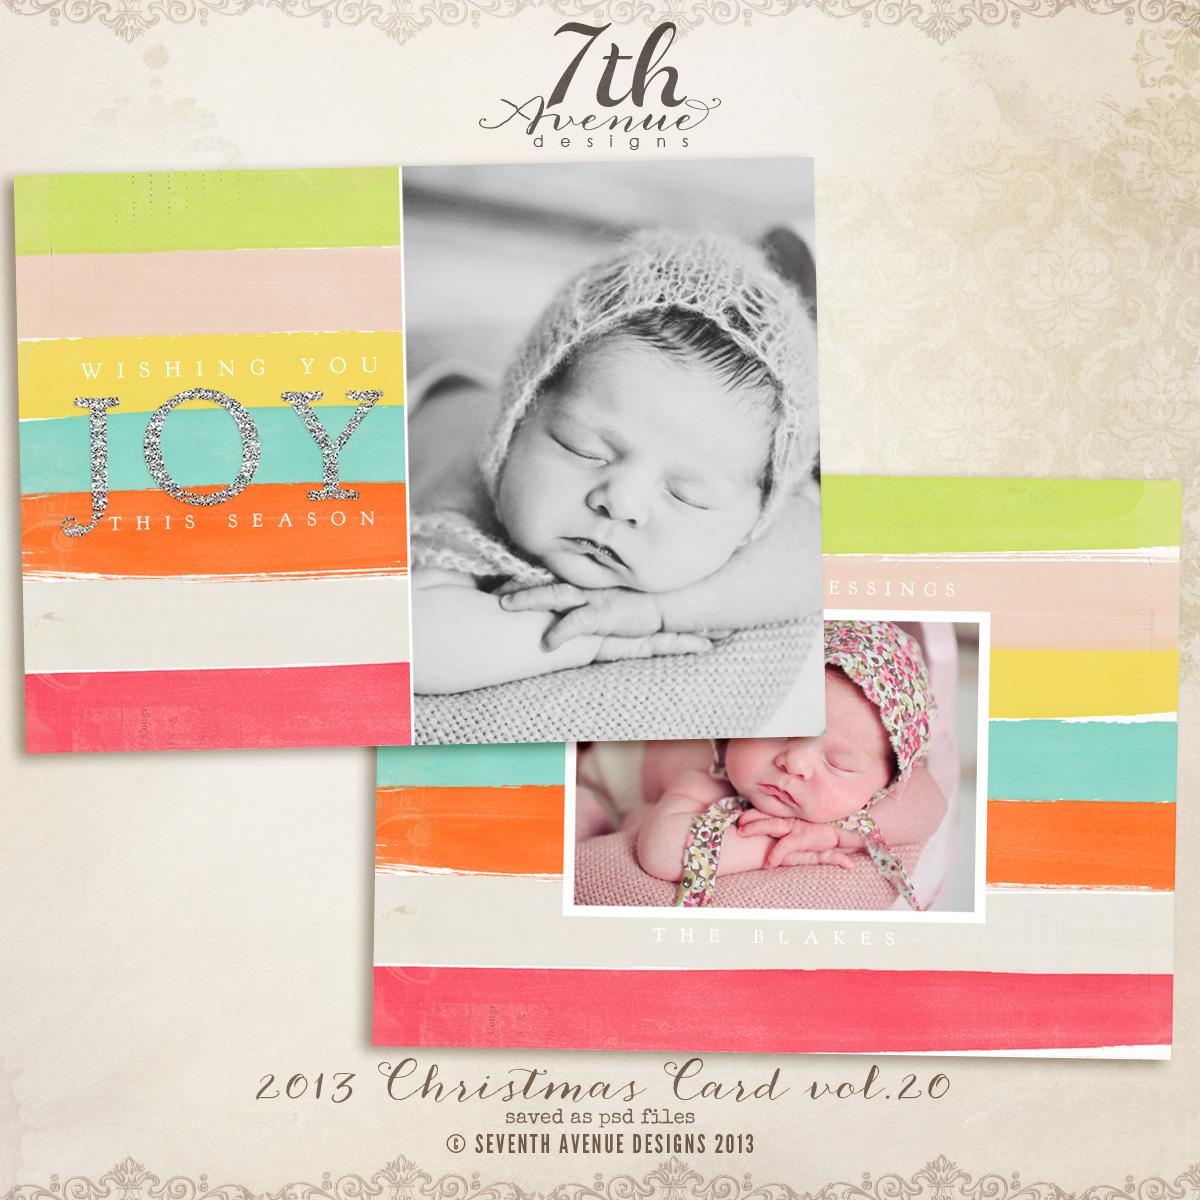 Christmas Card Templates Vol Cc ThAvenue - Christmas card templates for photographers 2